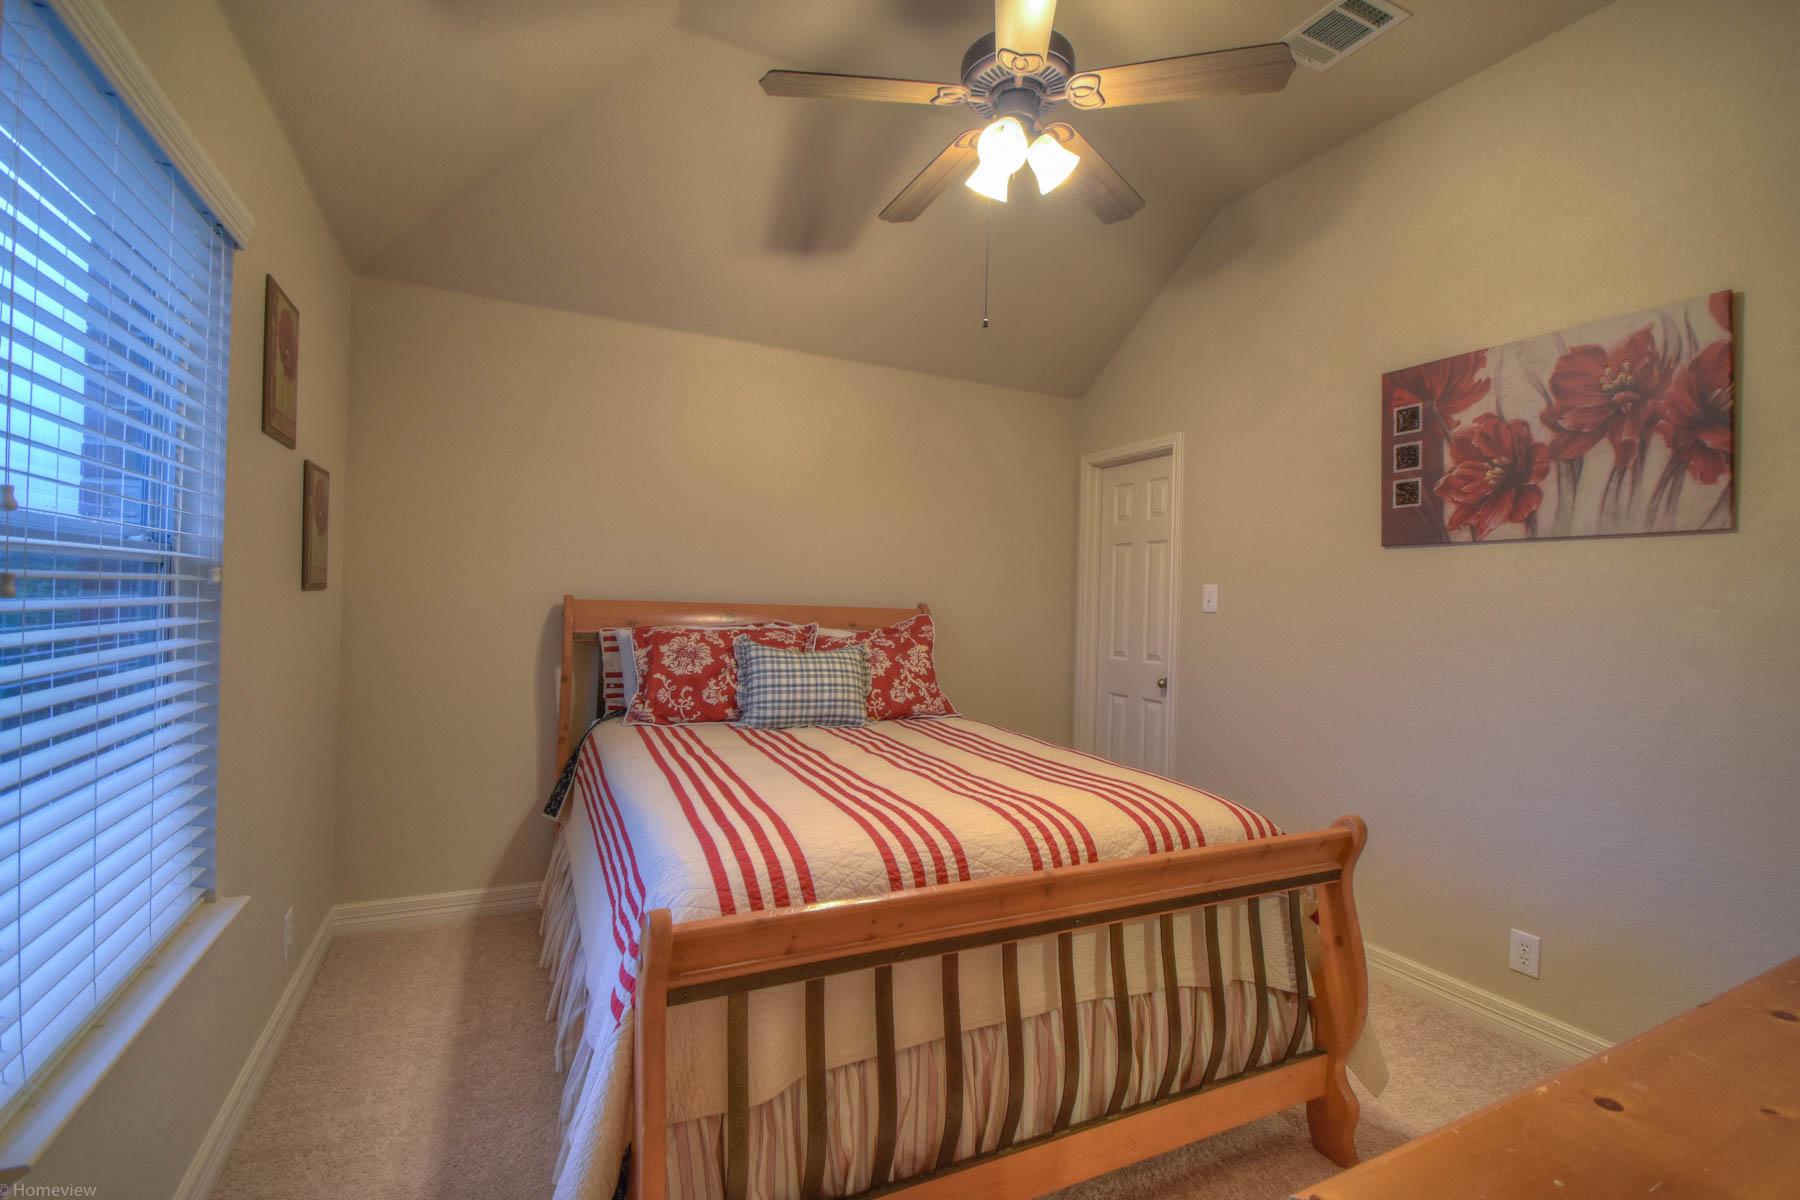 Additional photo for property listing at Captivating Home in Cibolo Canyons Ventana 23922 Western Meadow San Antonio, Texas 78261 Estados Unidos